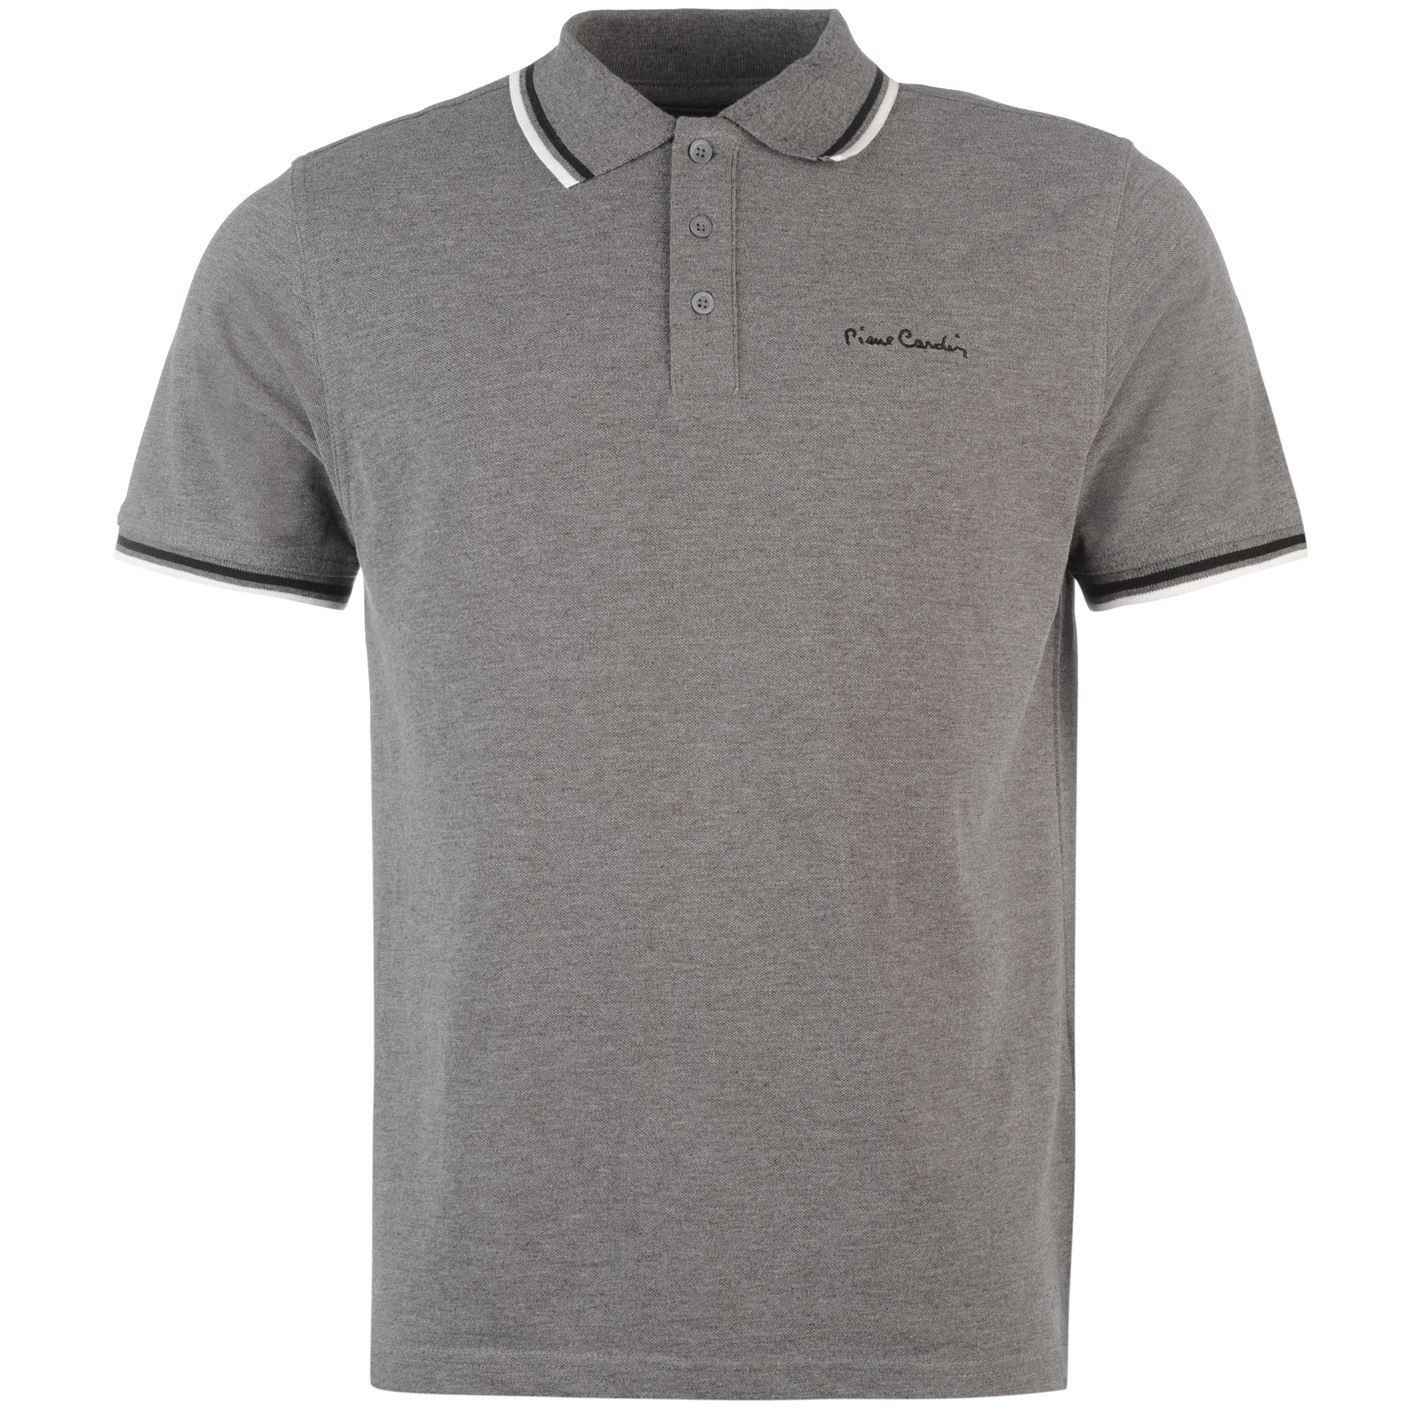 Pierre-Cardin-Tipped-Polo-Shirt-Mens-Top-Tee-Casual-Collar-T-Shirt thumbnail 3